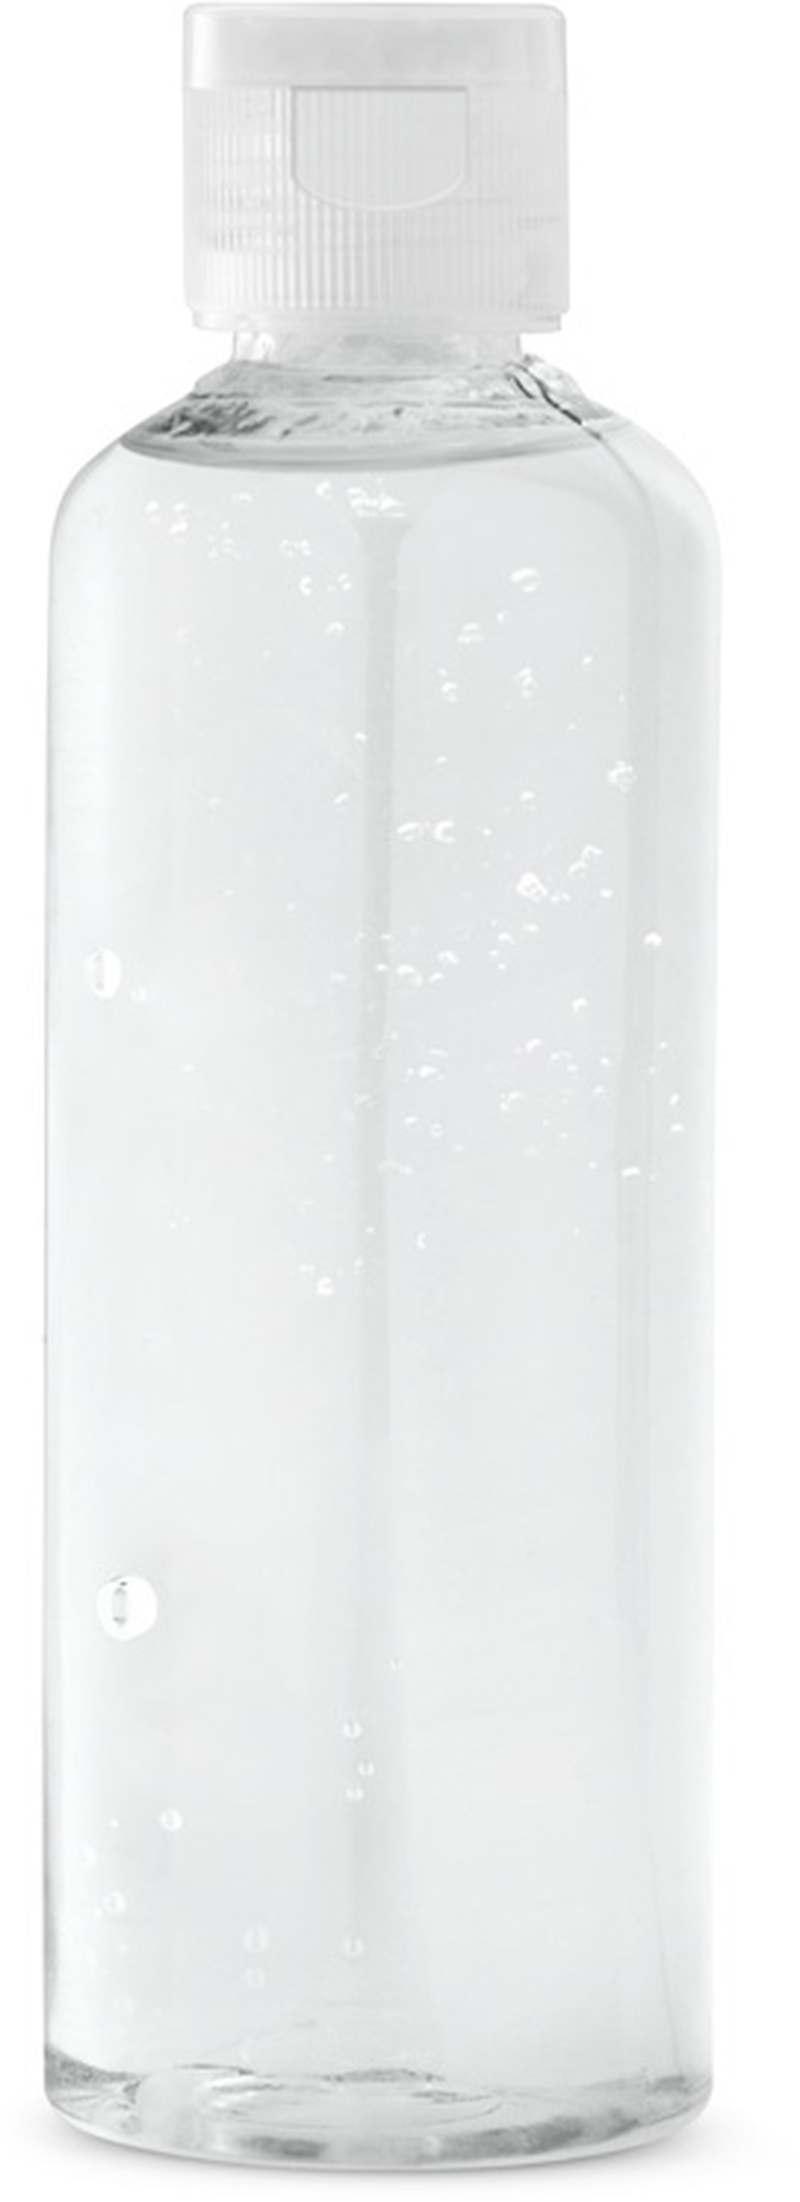 KLINE 100. Sanitační gel na ruce 100 ml